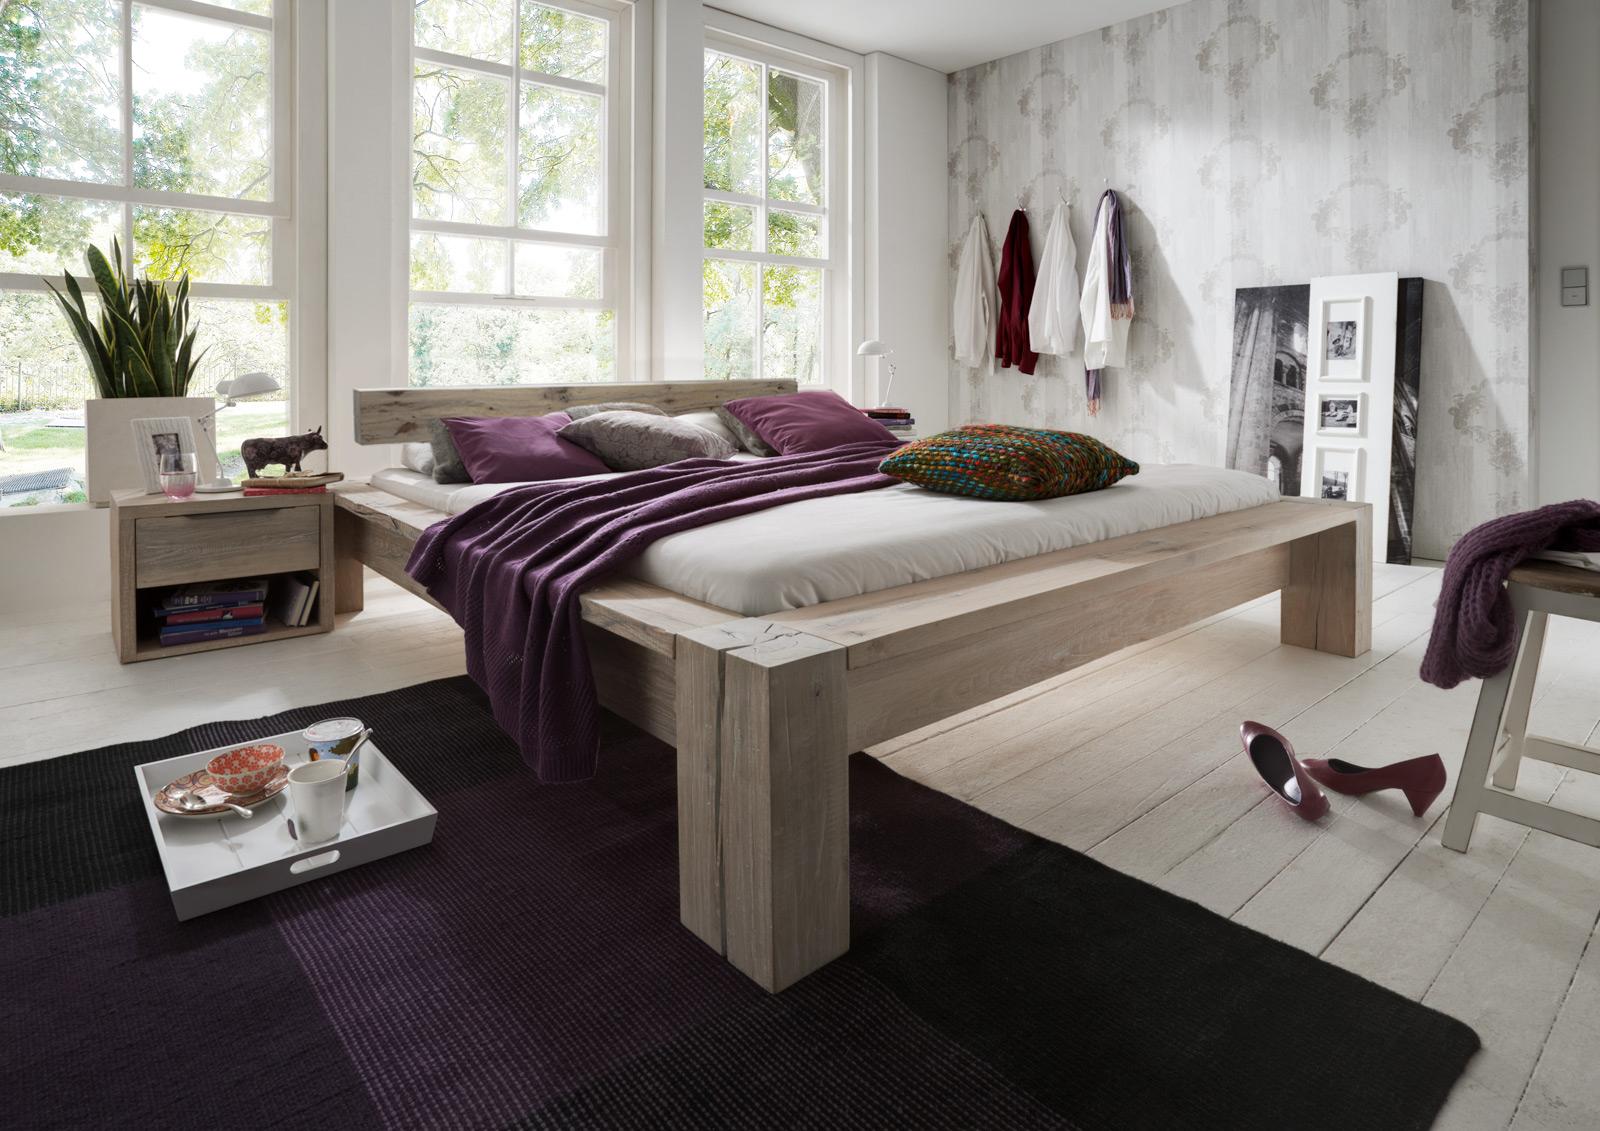 Sam balkenbett carla eiche 200x200 cm balken farbauswahl for Farbauswahl wohnung